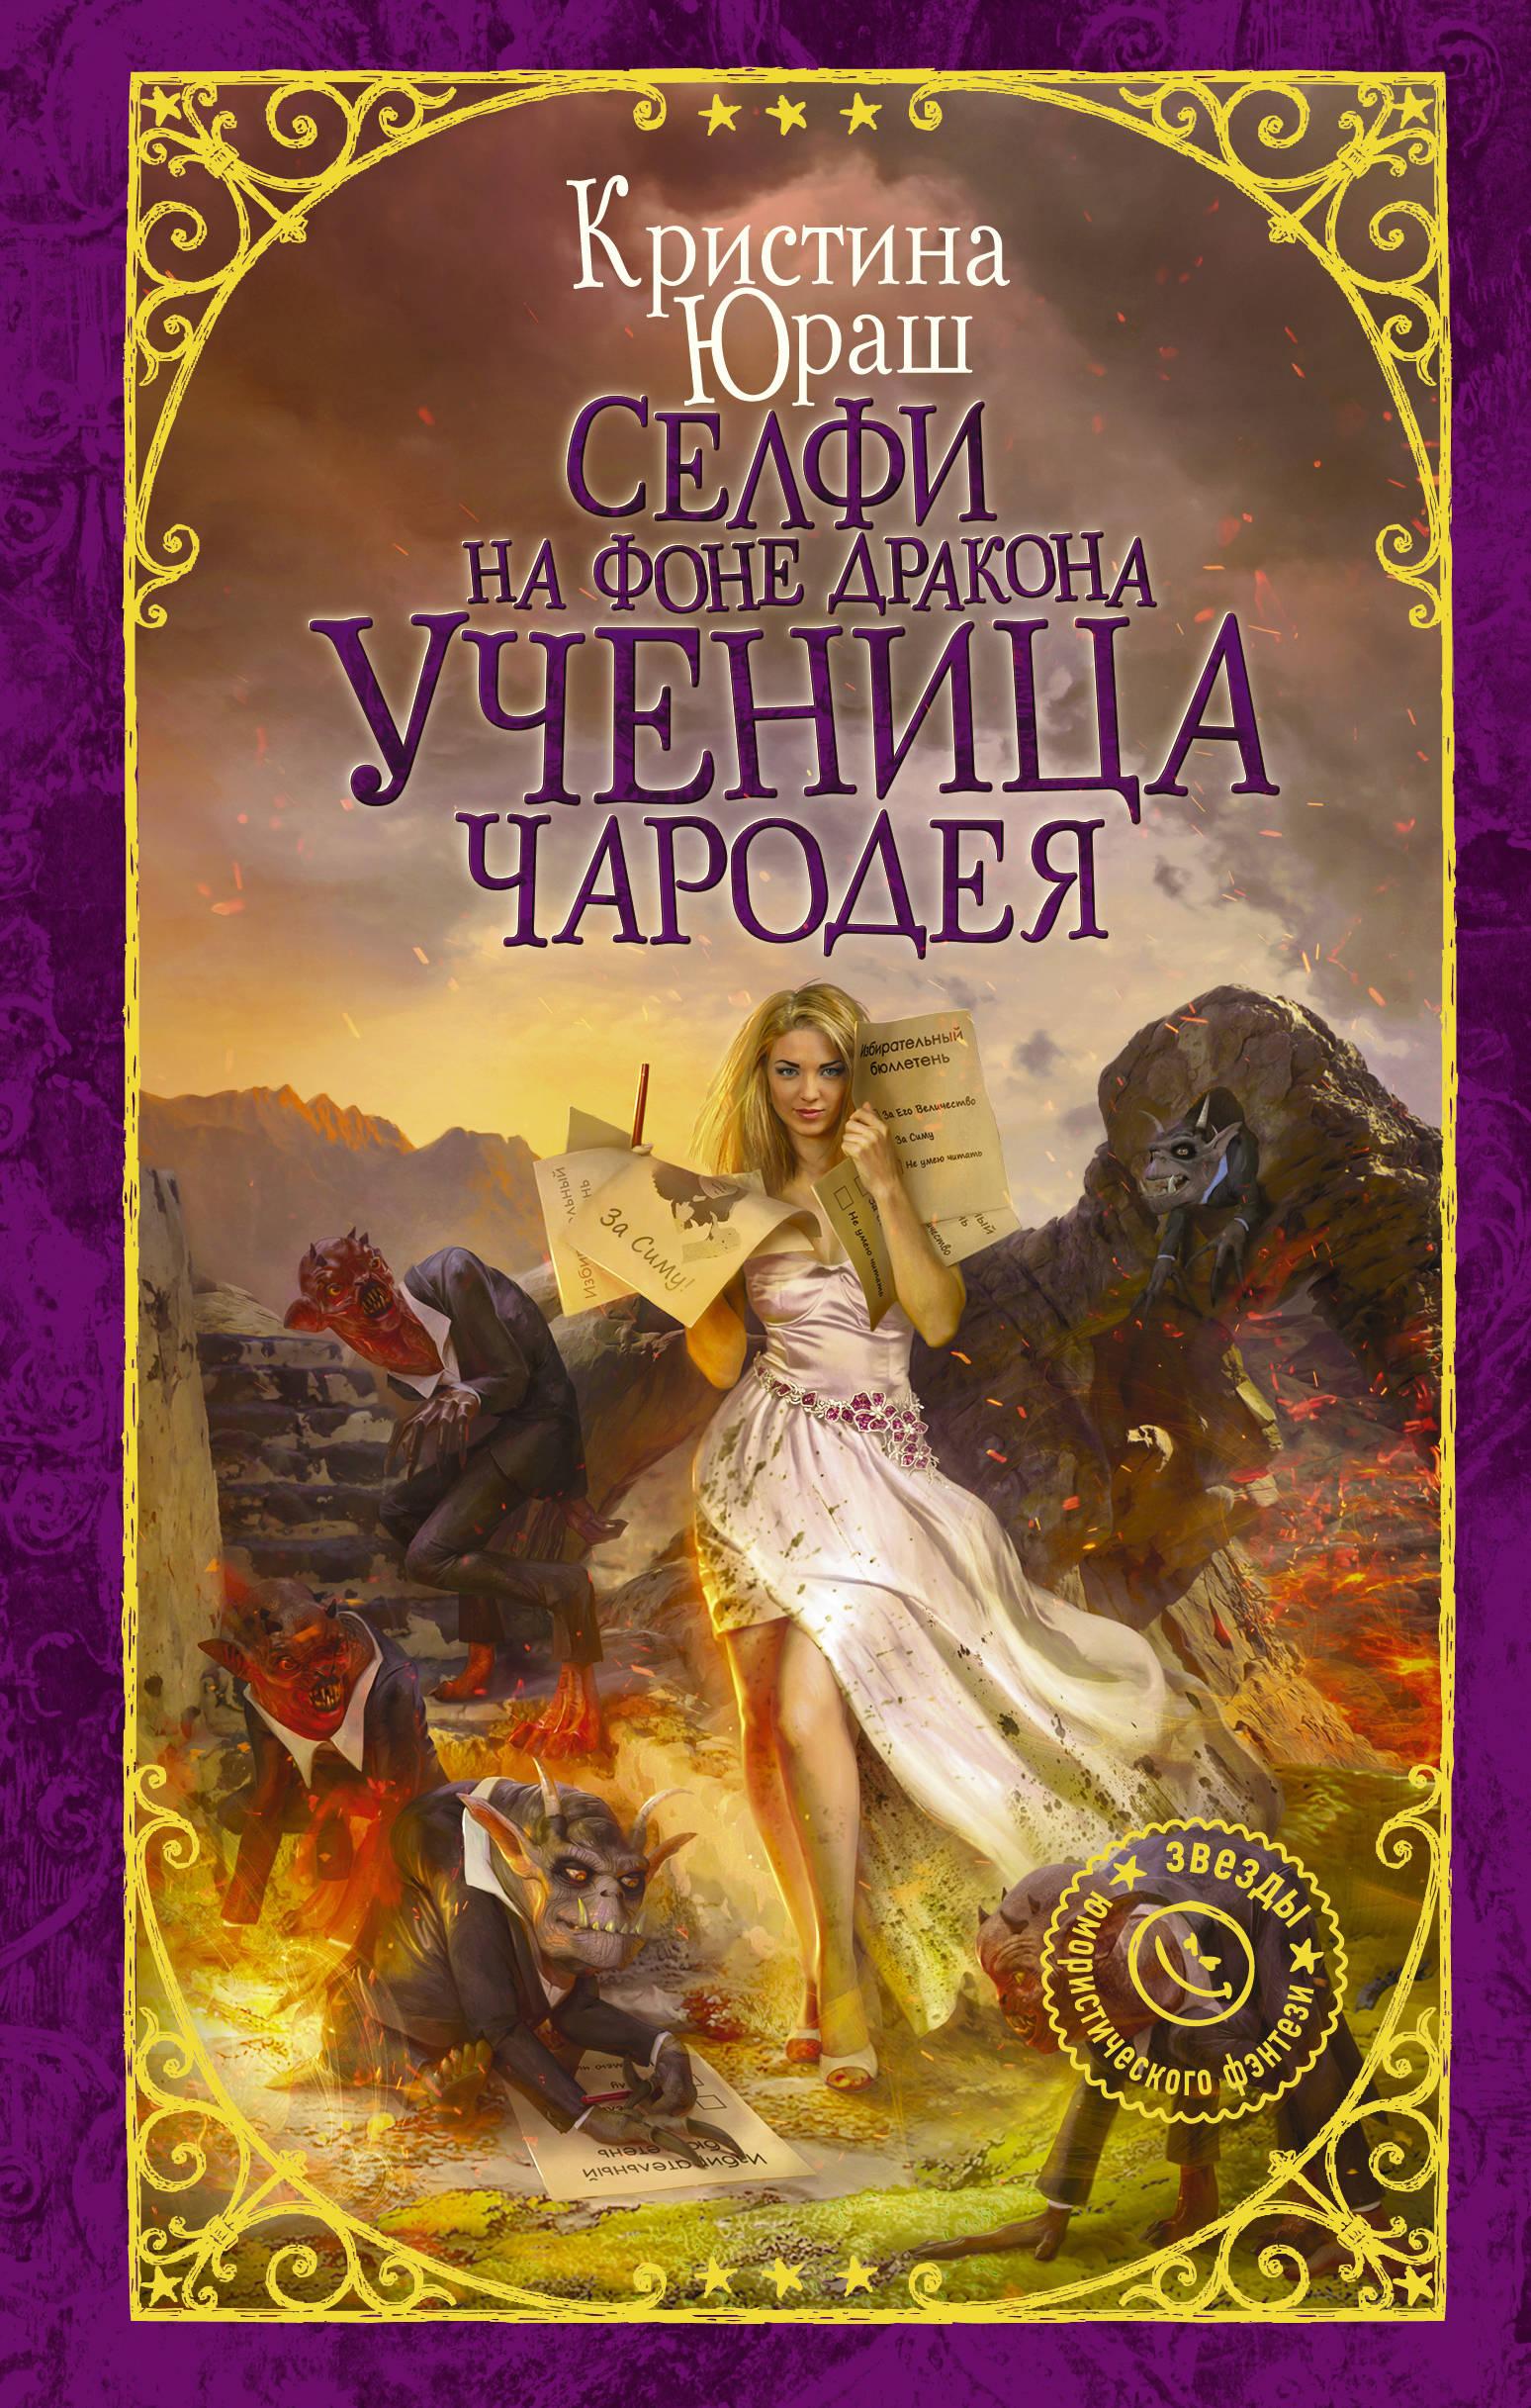 Кристина Юраш Селфи на фоне дракона. Ученица чародея юраш к селфи на фоне дракона